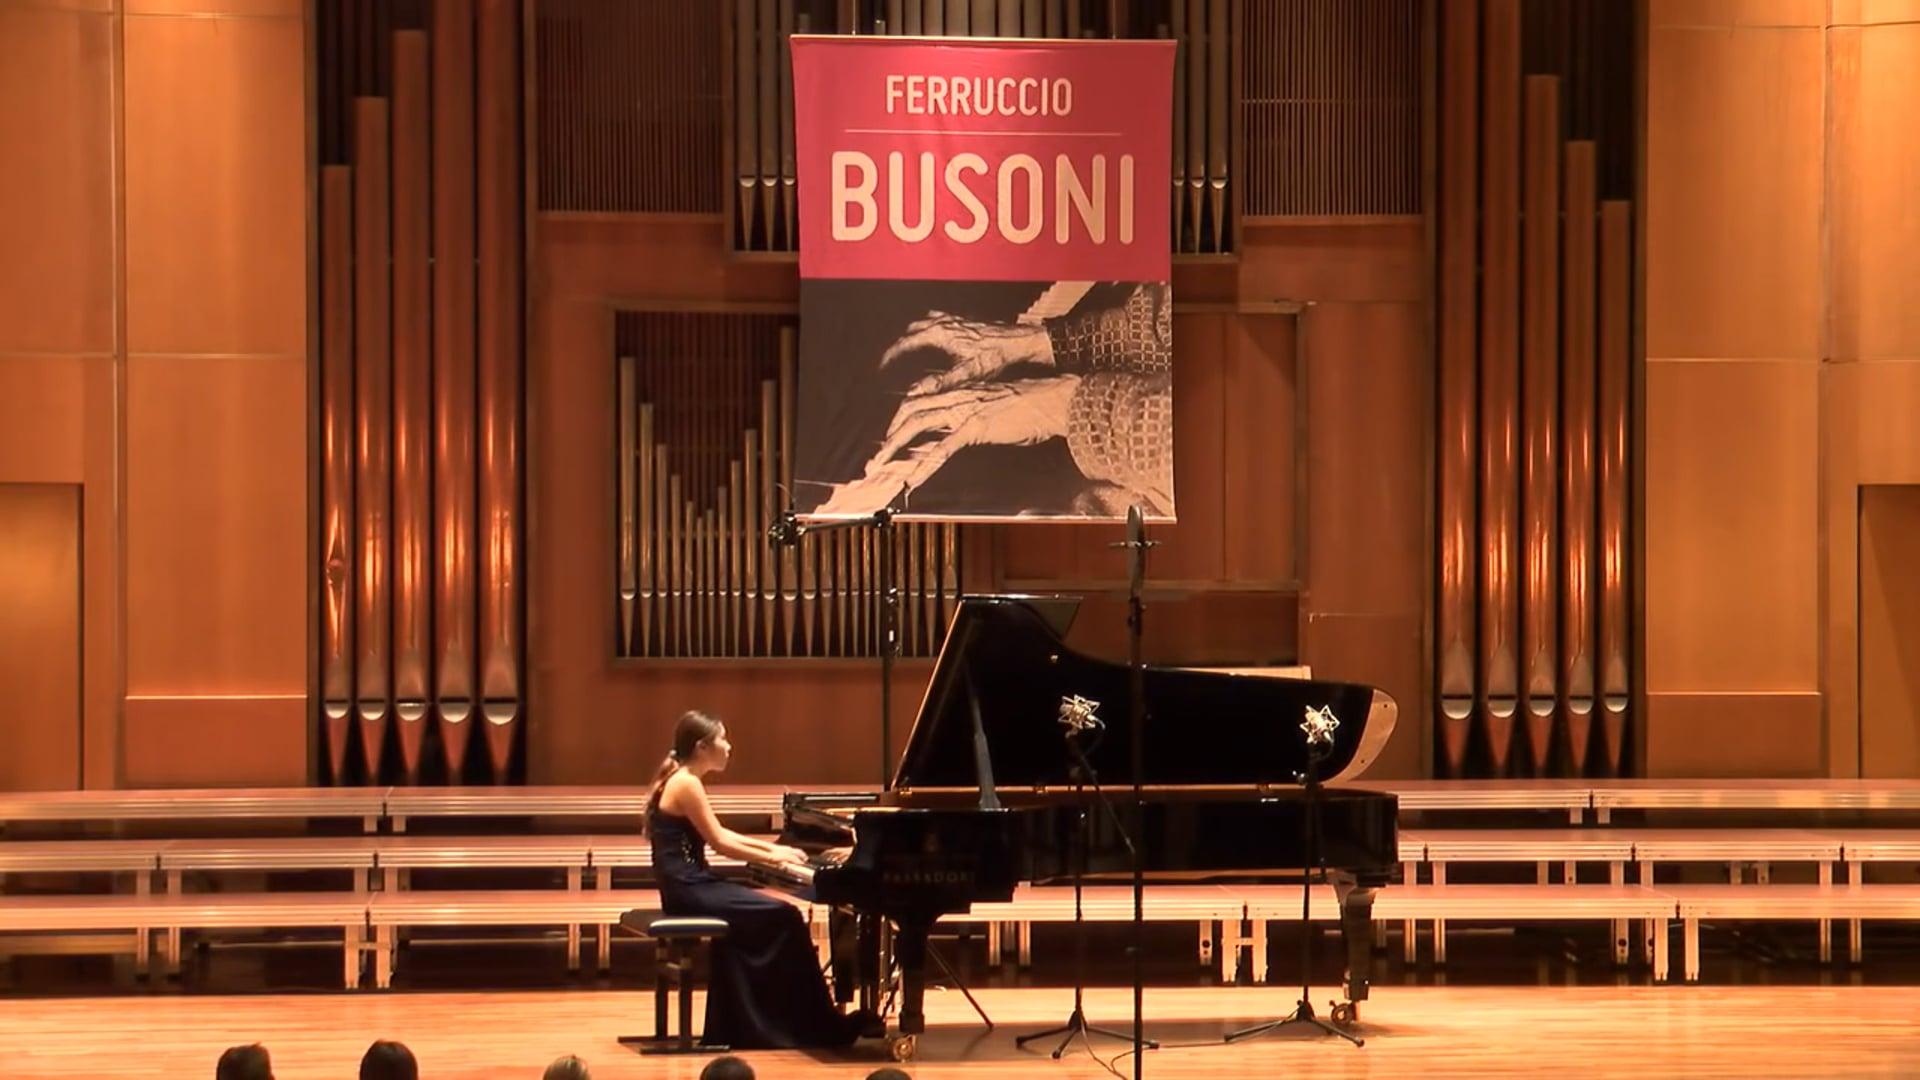 Chloe (Ji-Yeong) Mun - Solo Semi-Finals - 60th F. Busoni International Piano Competition